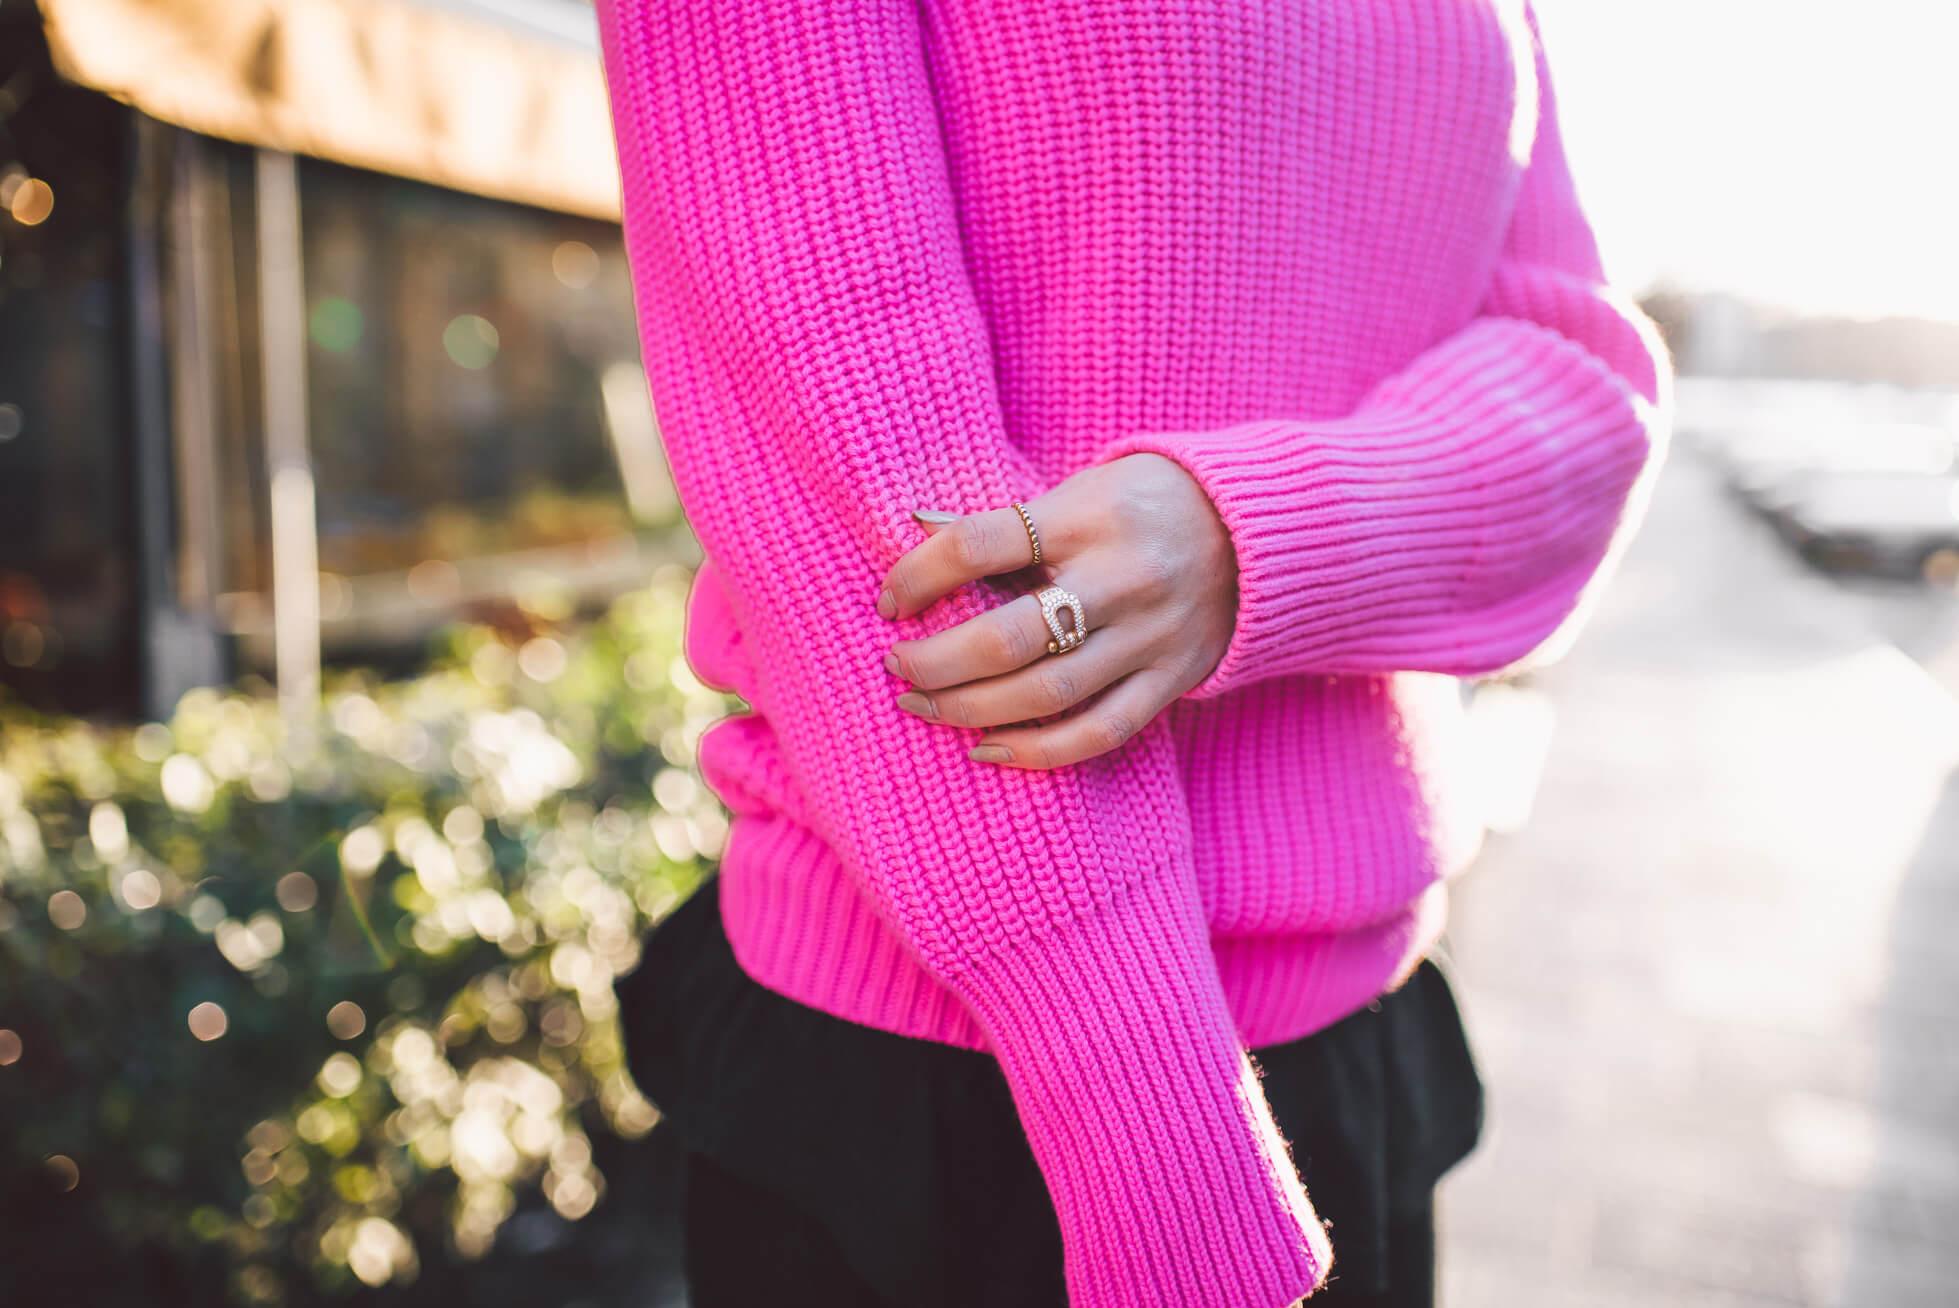 janni-deler-pink-touch-yooxDSC_2956-Redigera